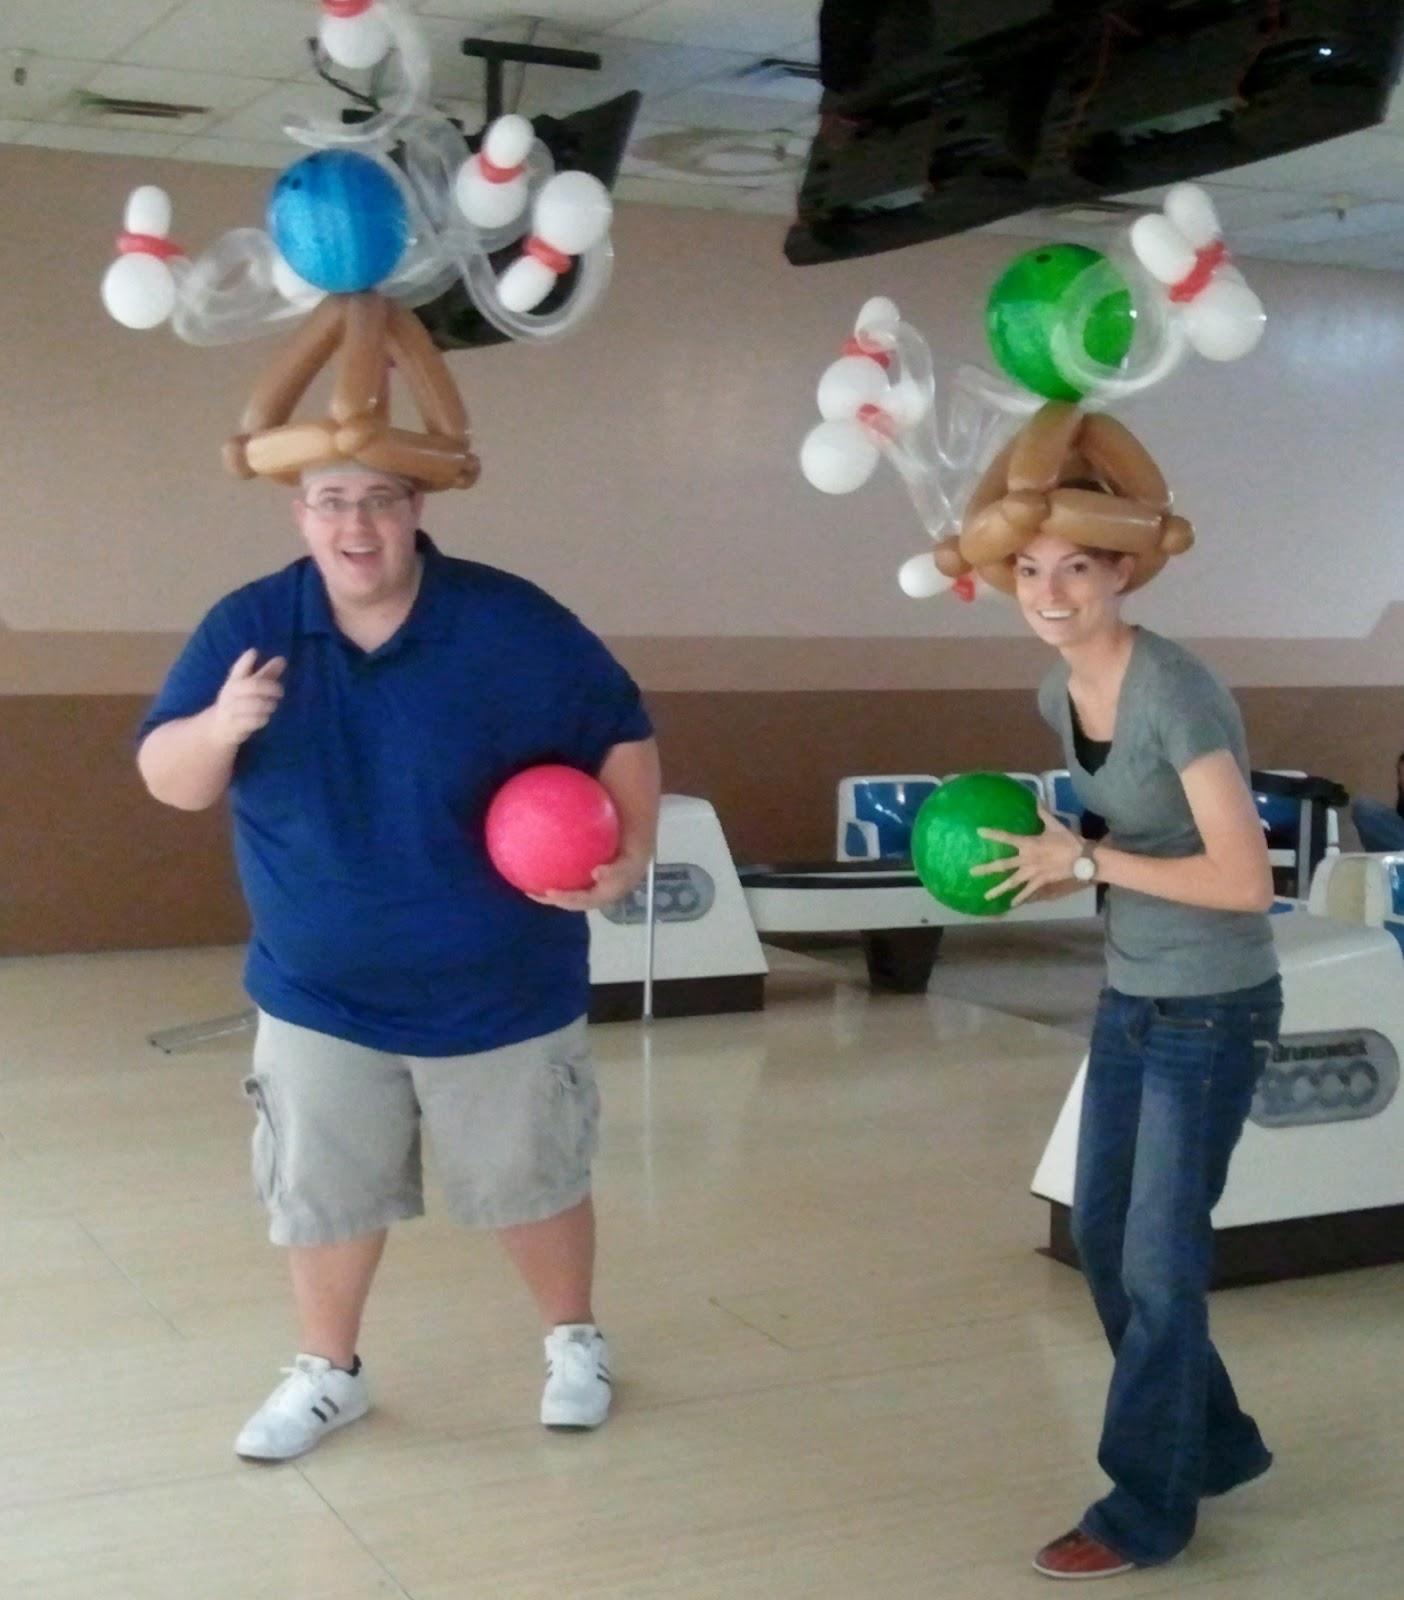 Bowling pin balloons - Bowling Birthday Party And Balloons